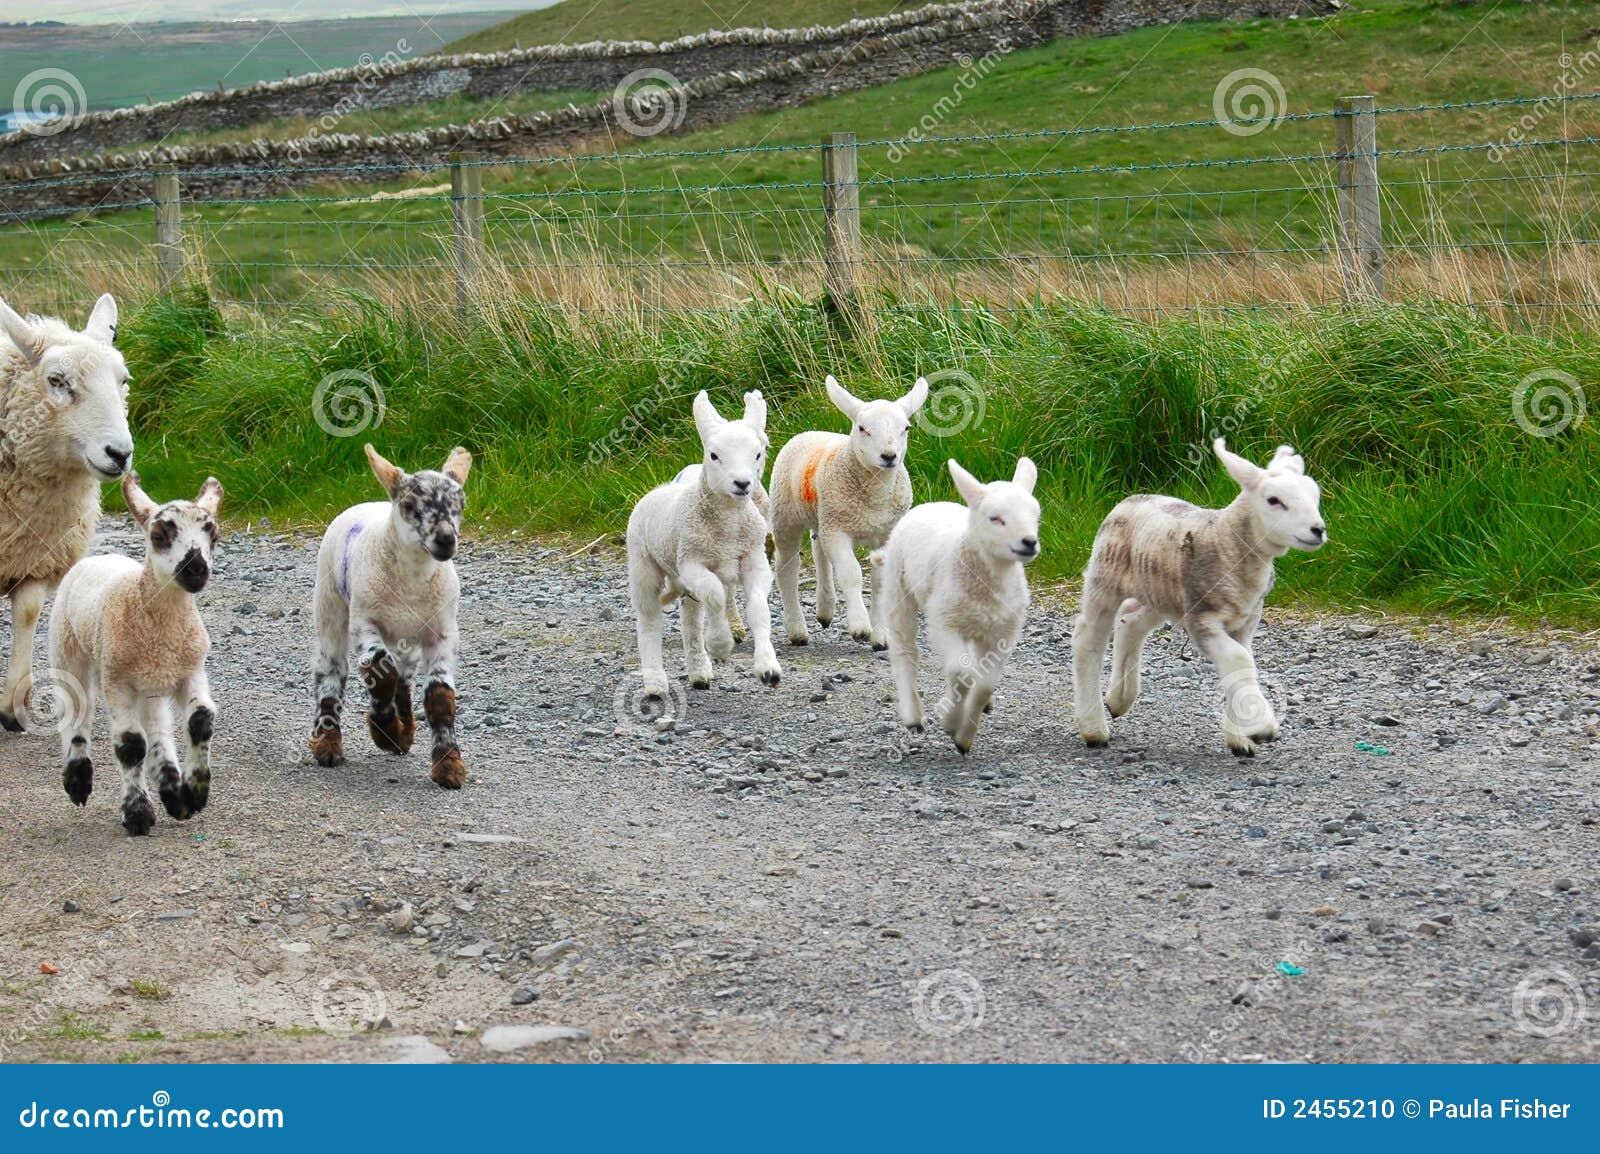 Lambs running stock photo  Image of mammal, hopeful, cute